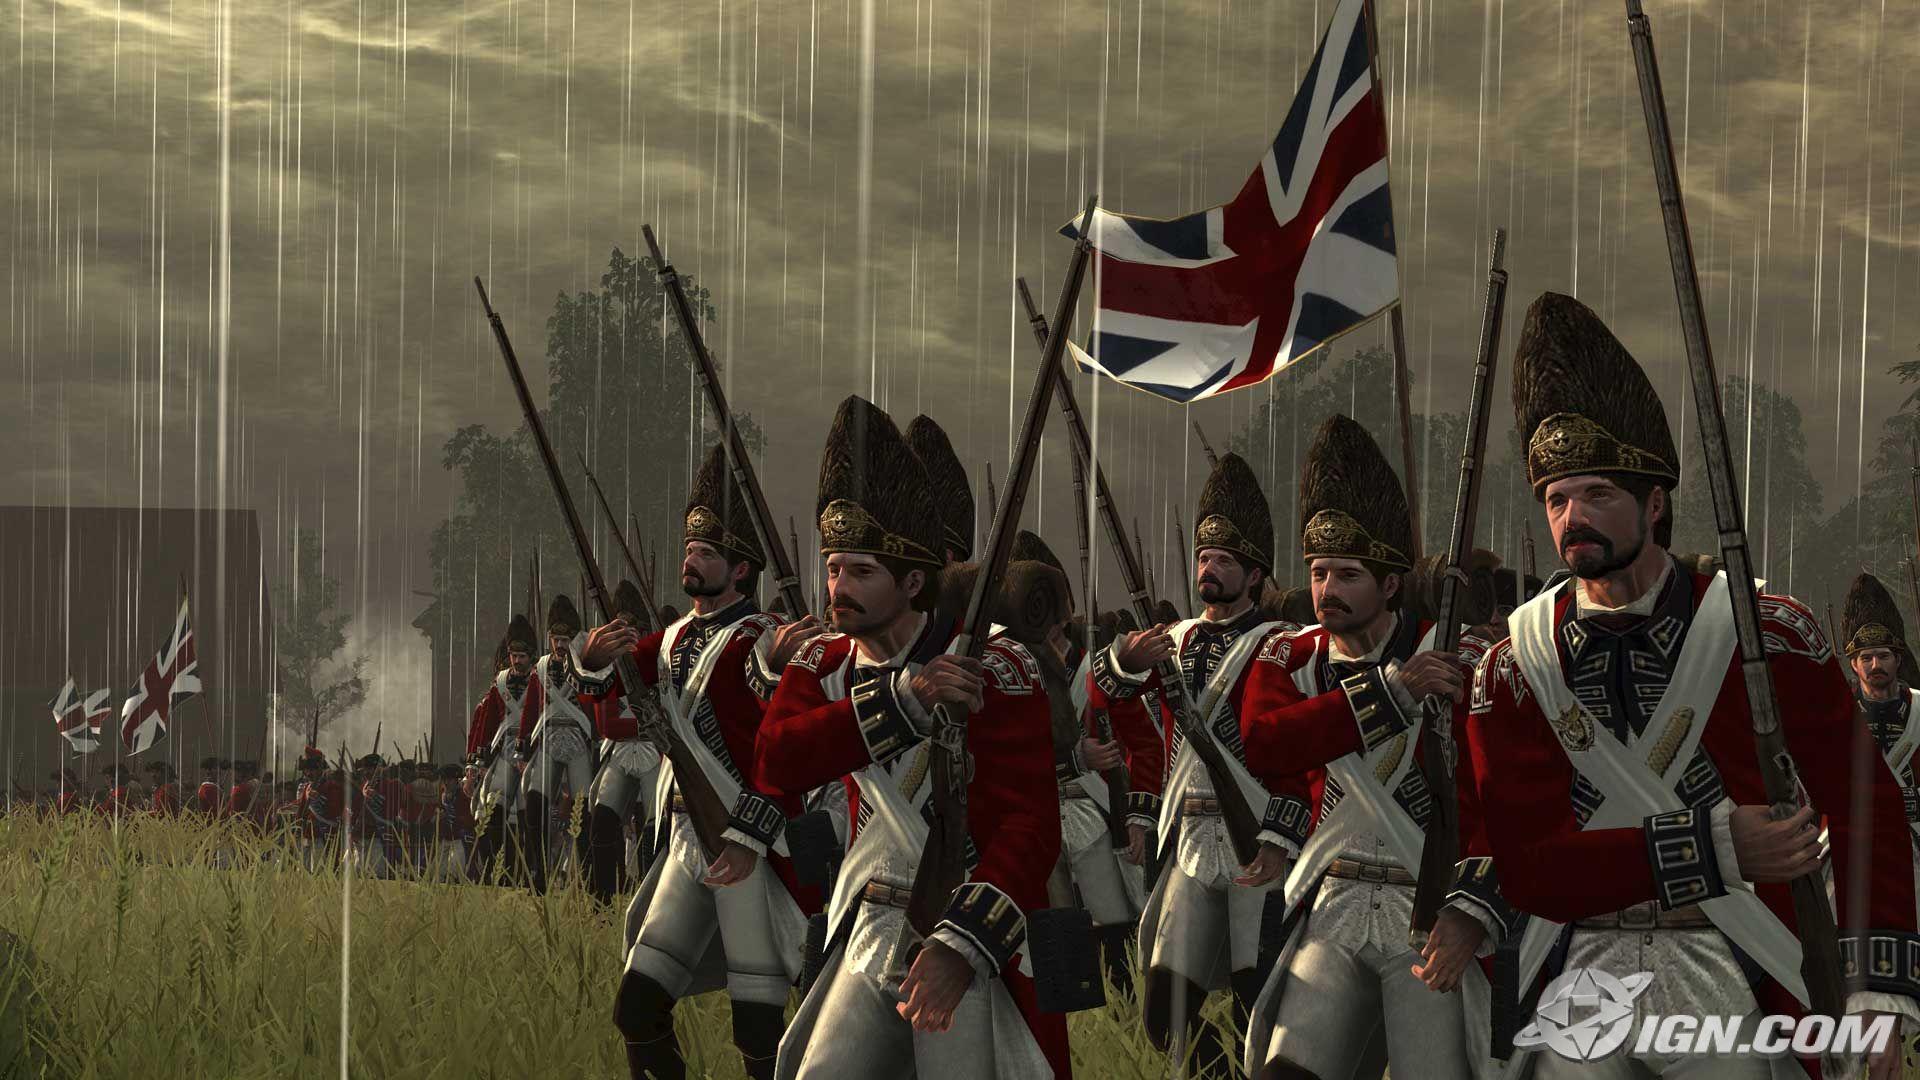 Empire Total War wallpaper 111682 1920x1080